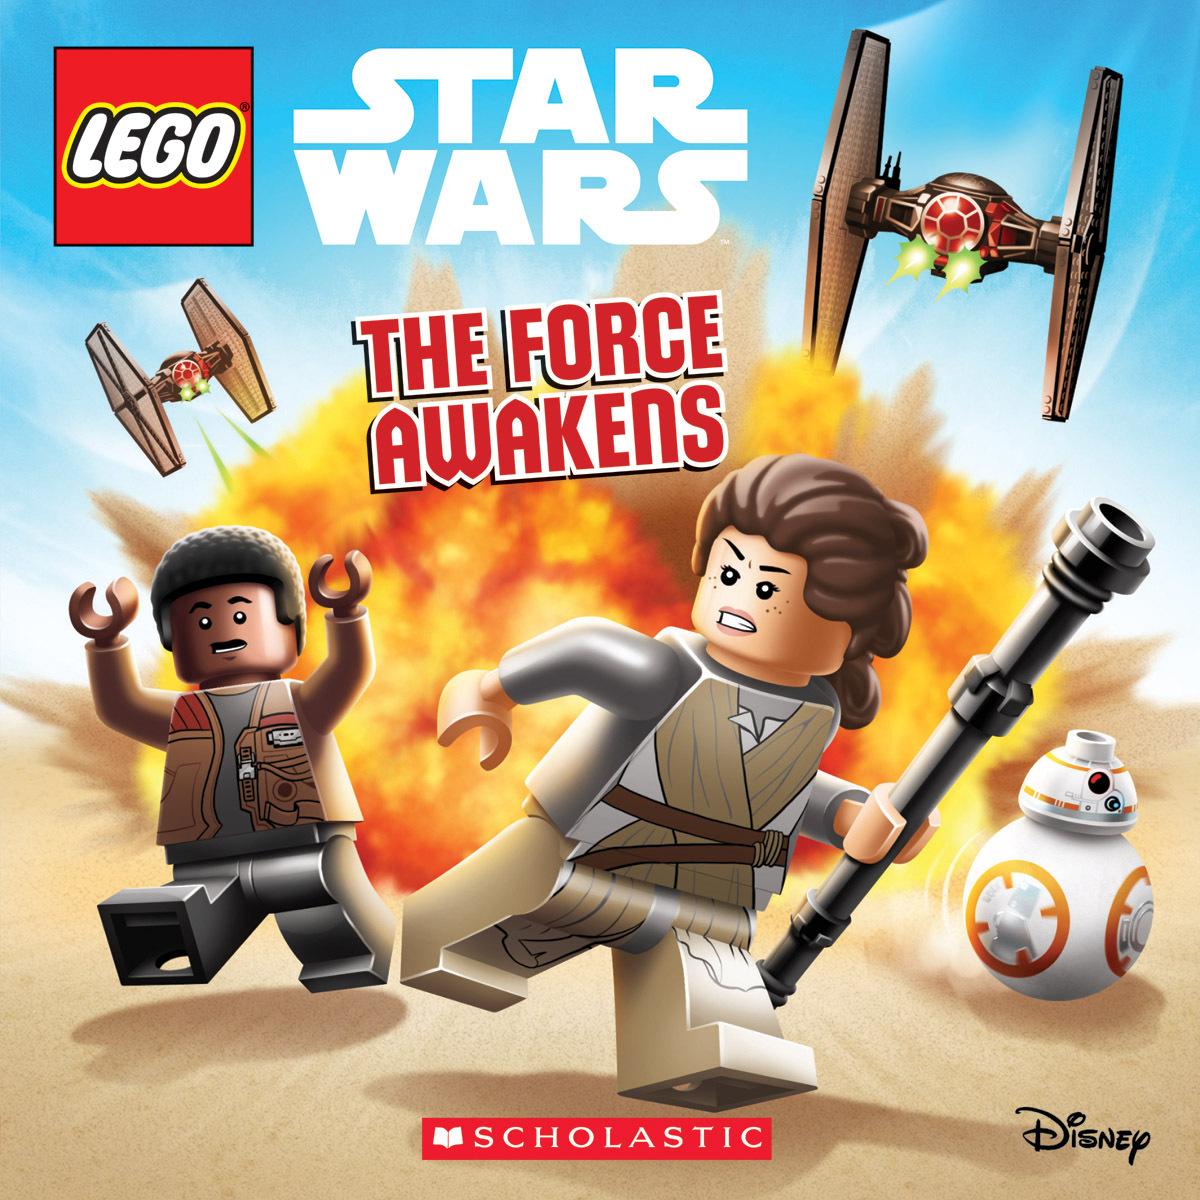 The Force Awakens (LEGO Star Wars: Episode VII 8X8)